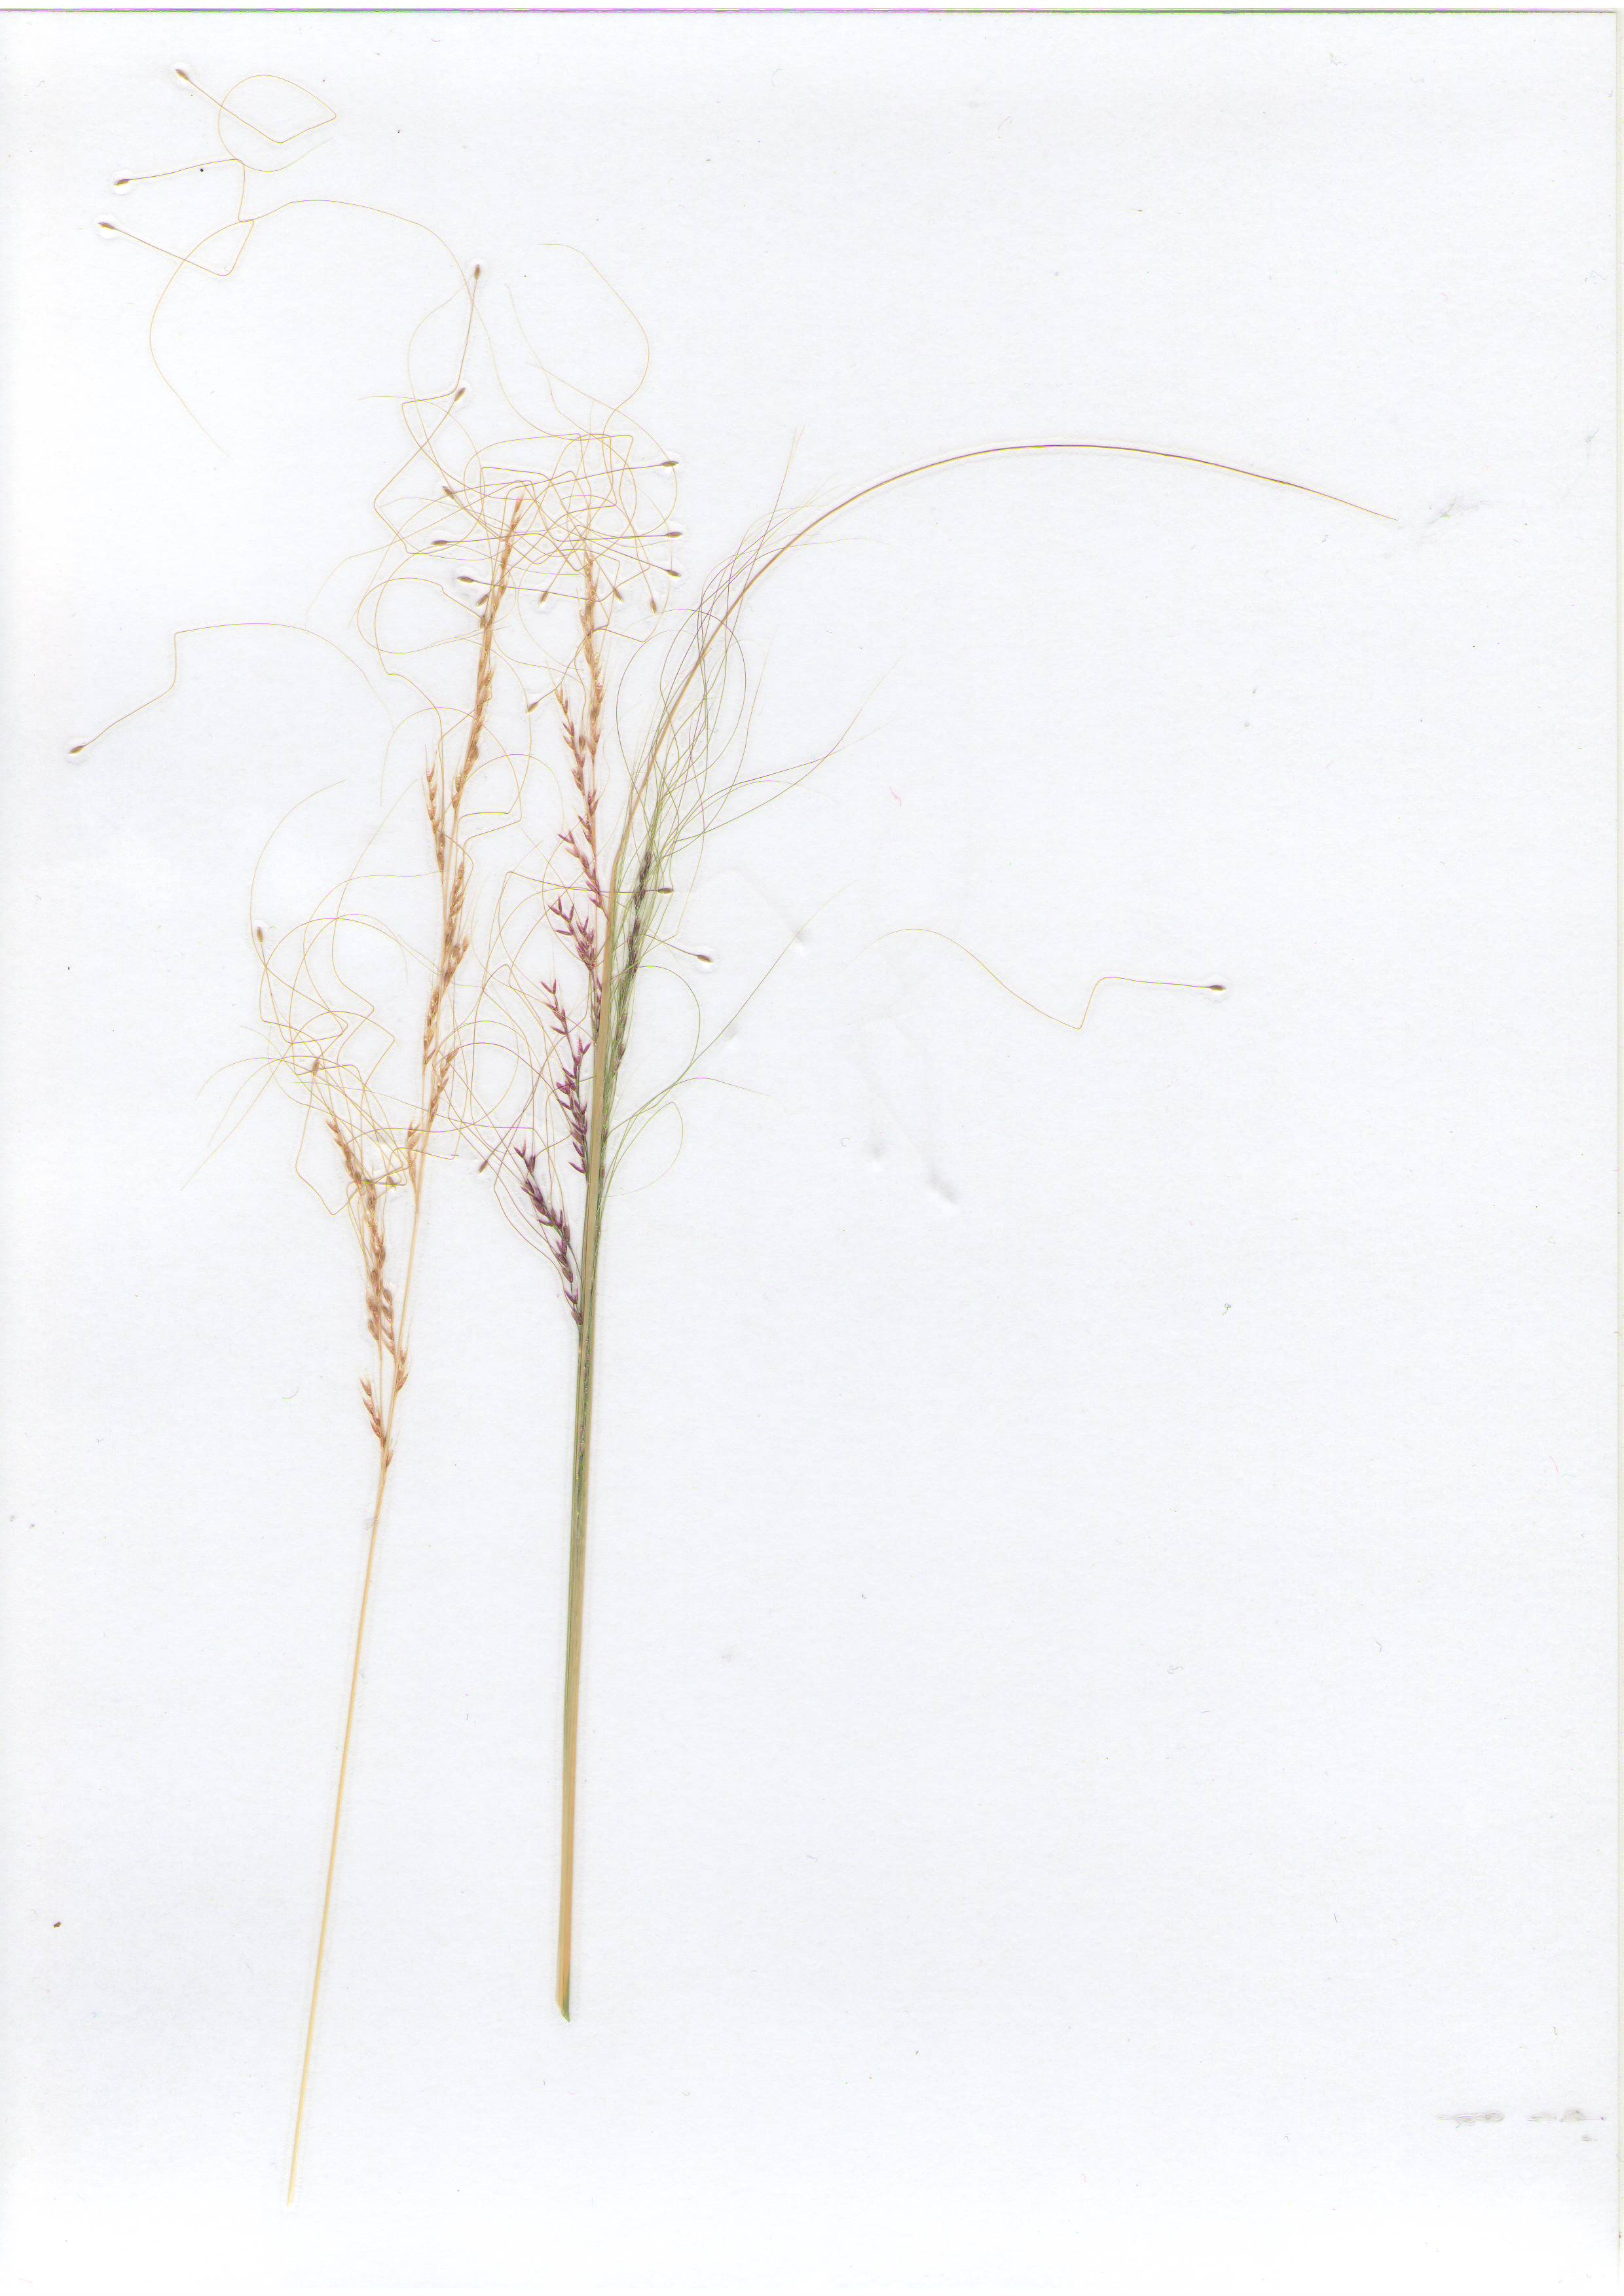 �ов�л� �он�ай�ий Stipa tenuissima